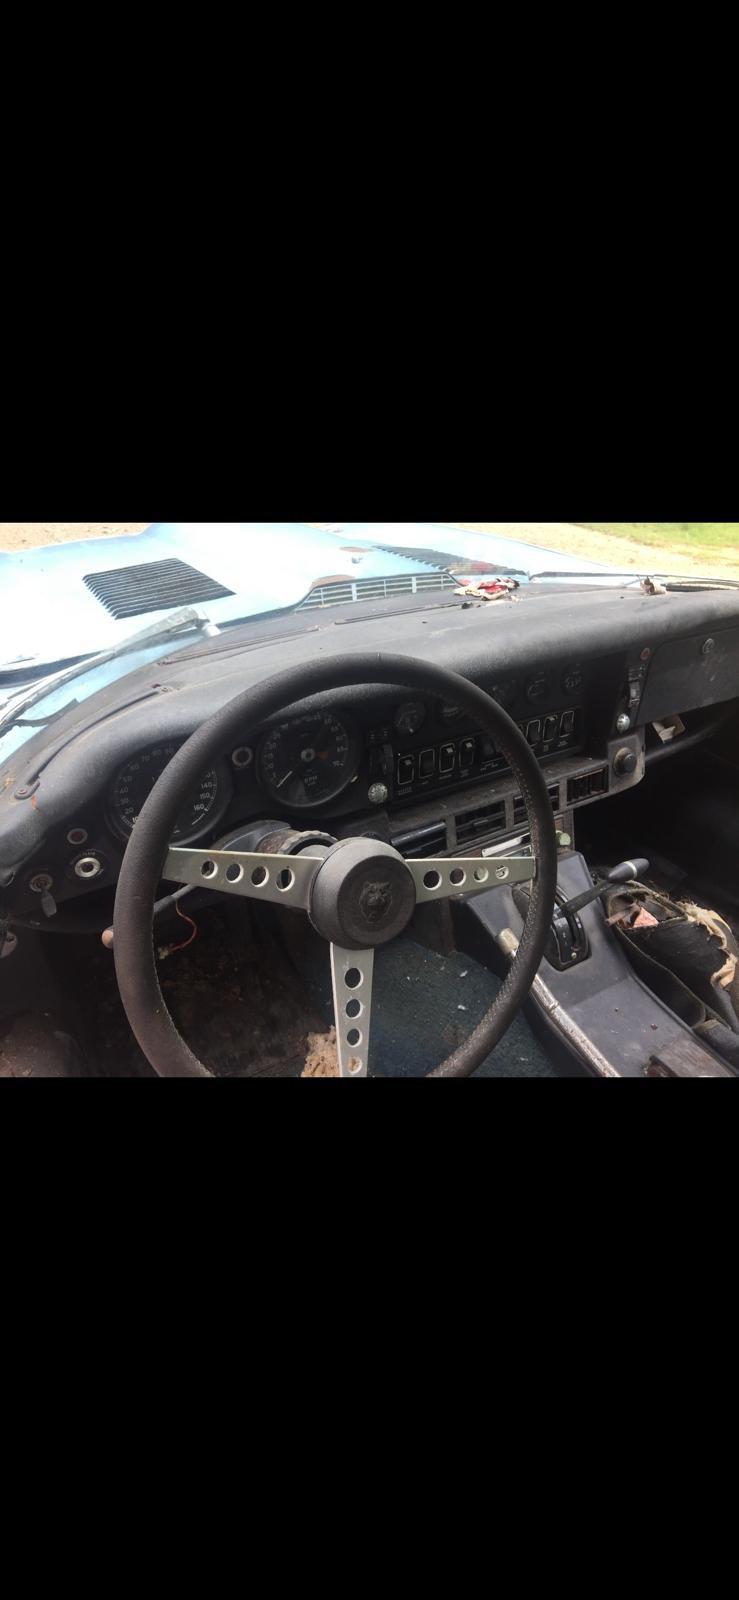 1971 Jaguar V12 Auto coupe  For Sale (picture 5 of 6)